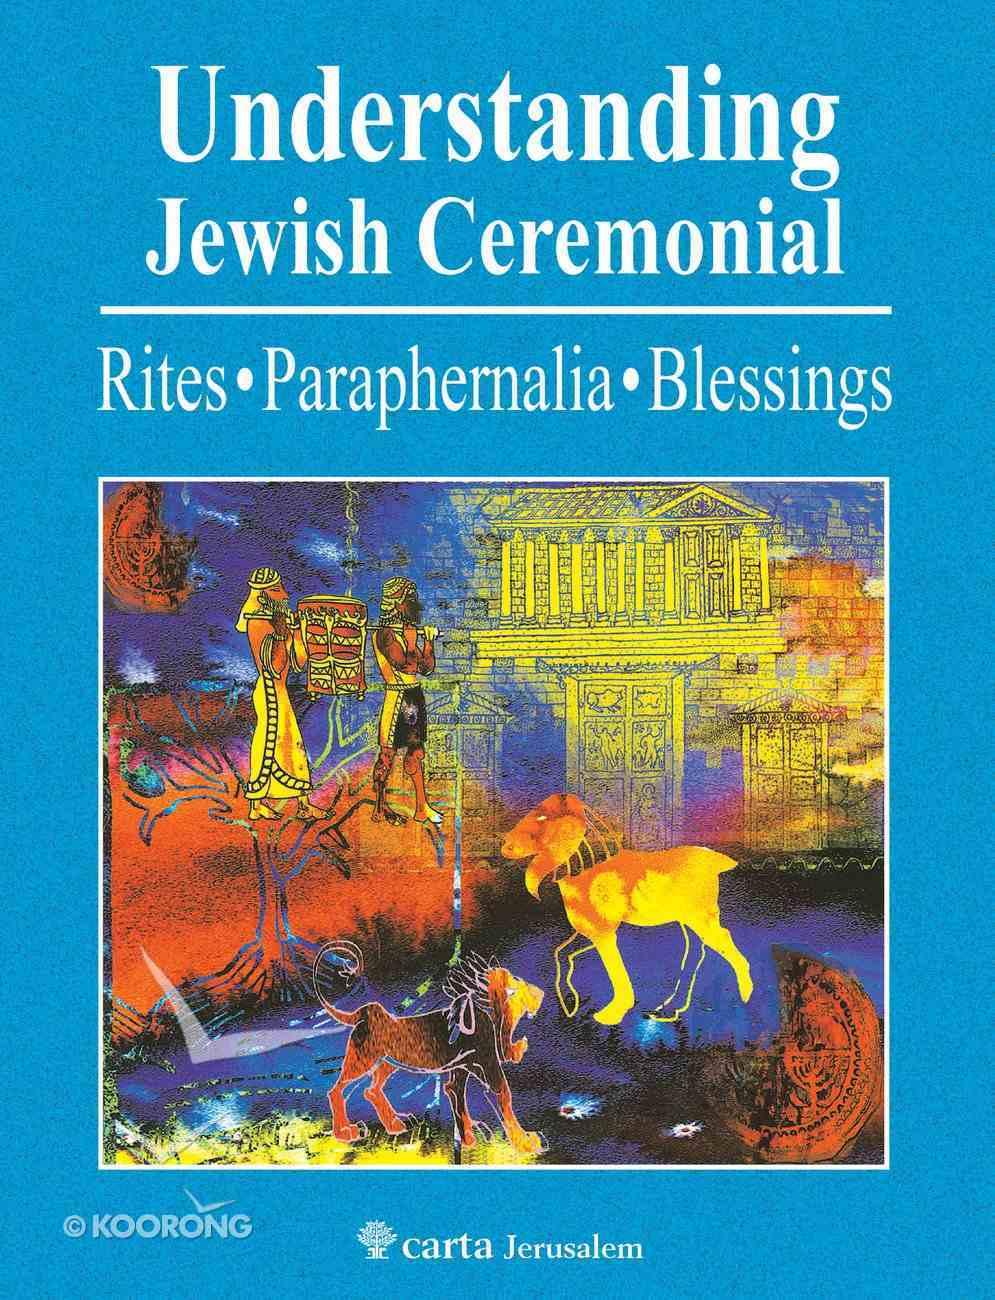 Understanding Jewish Ceremonial: Rites, Paraphernalia, Blessings Paperback